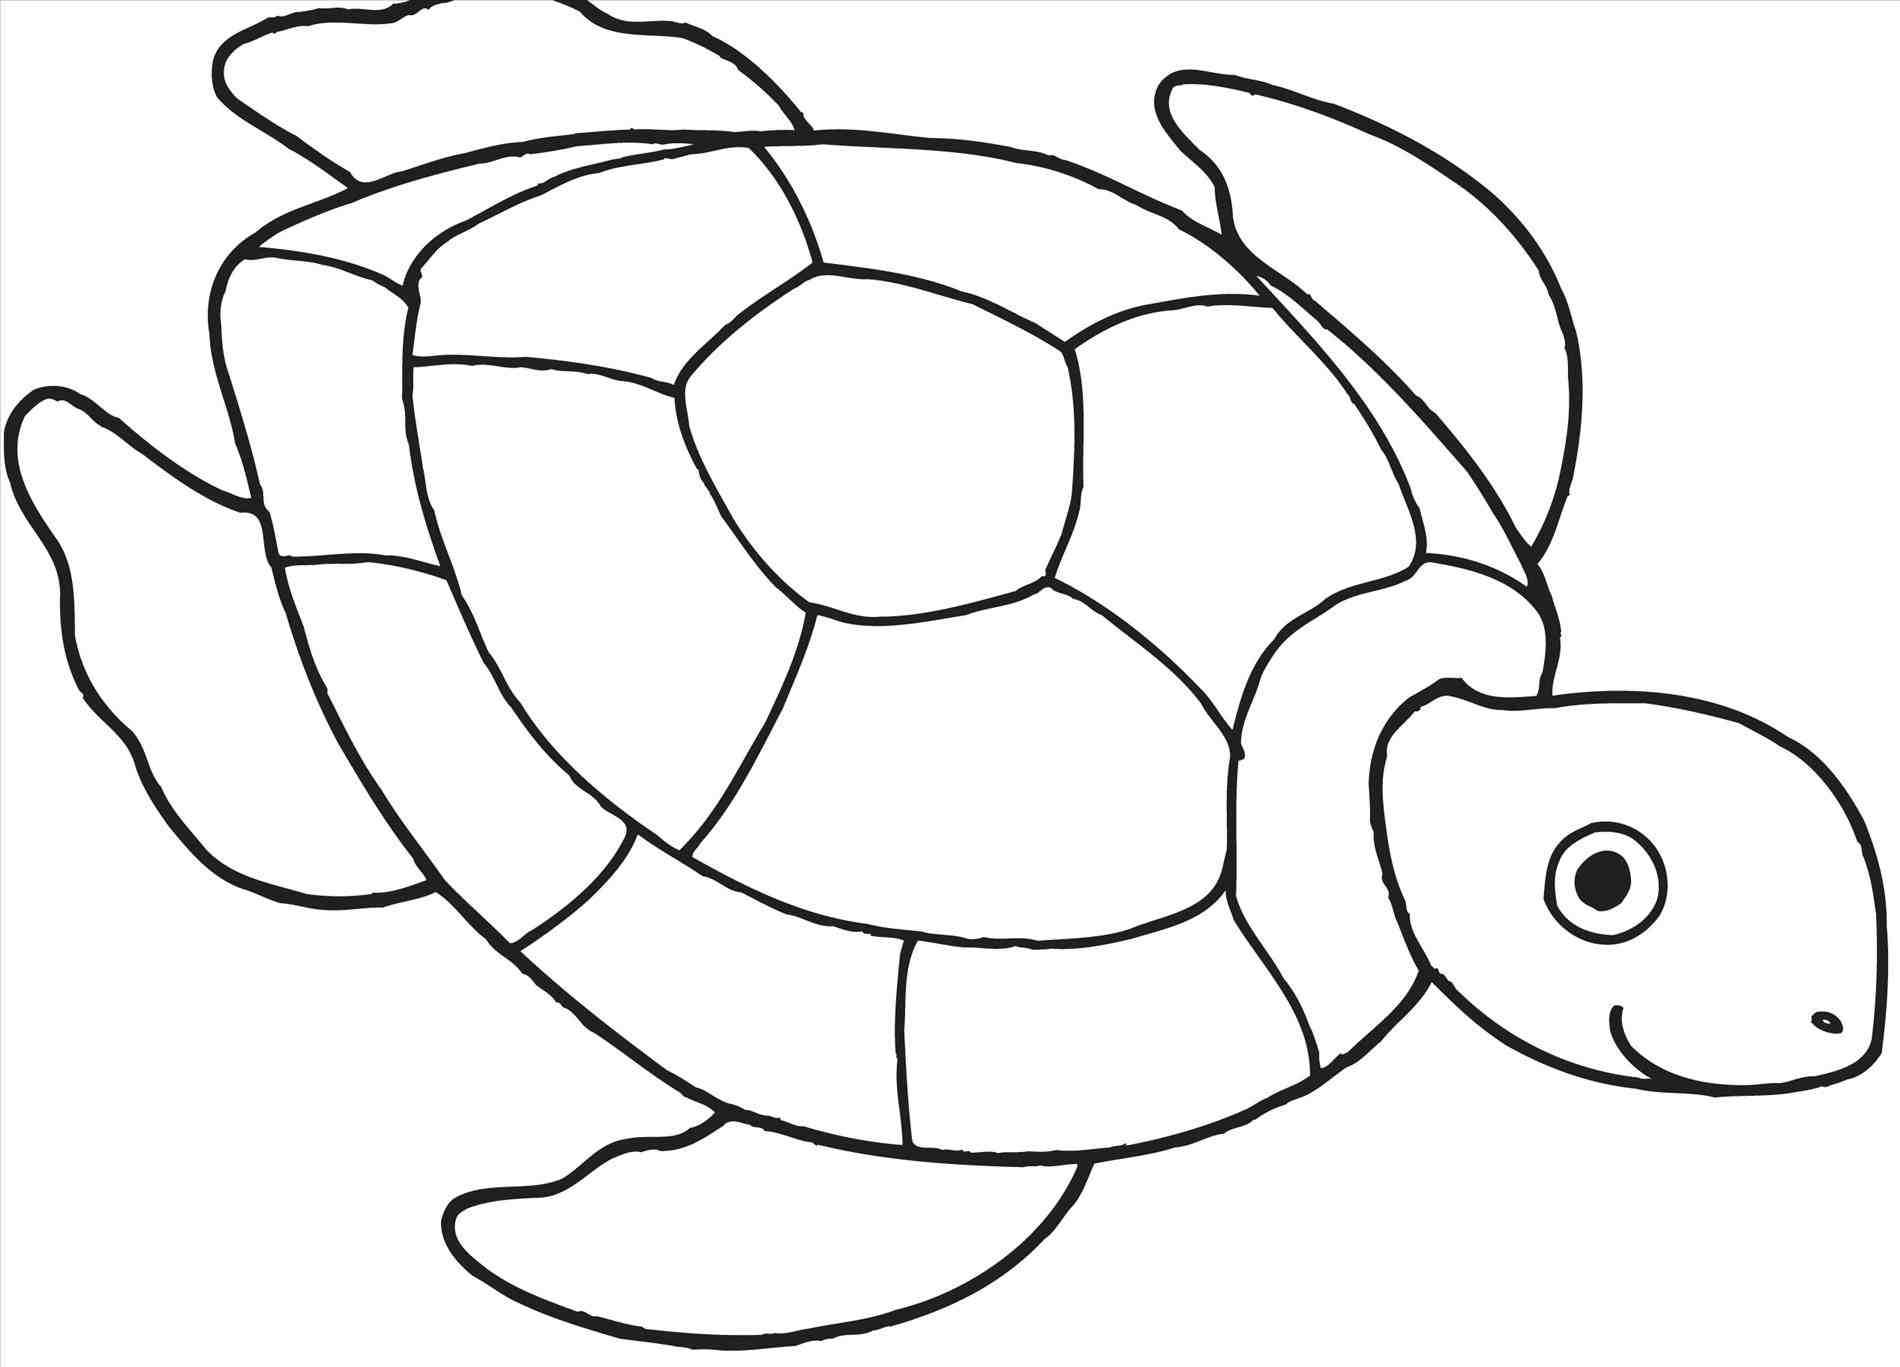 1900x1367 My Loggerhead Sea Turtle Drawing For Kids Caretta Loving My S